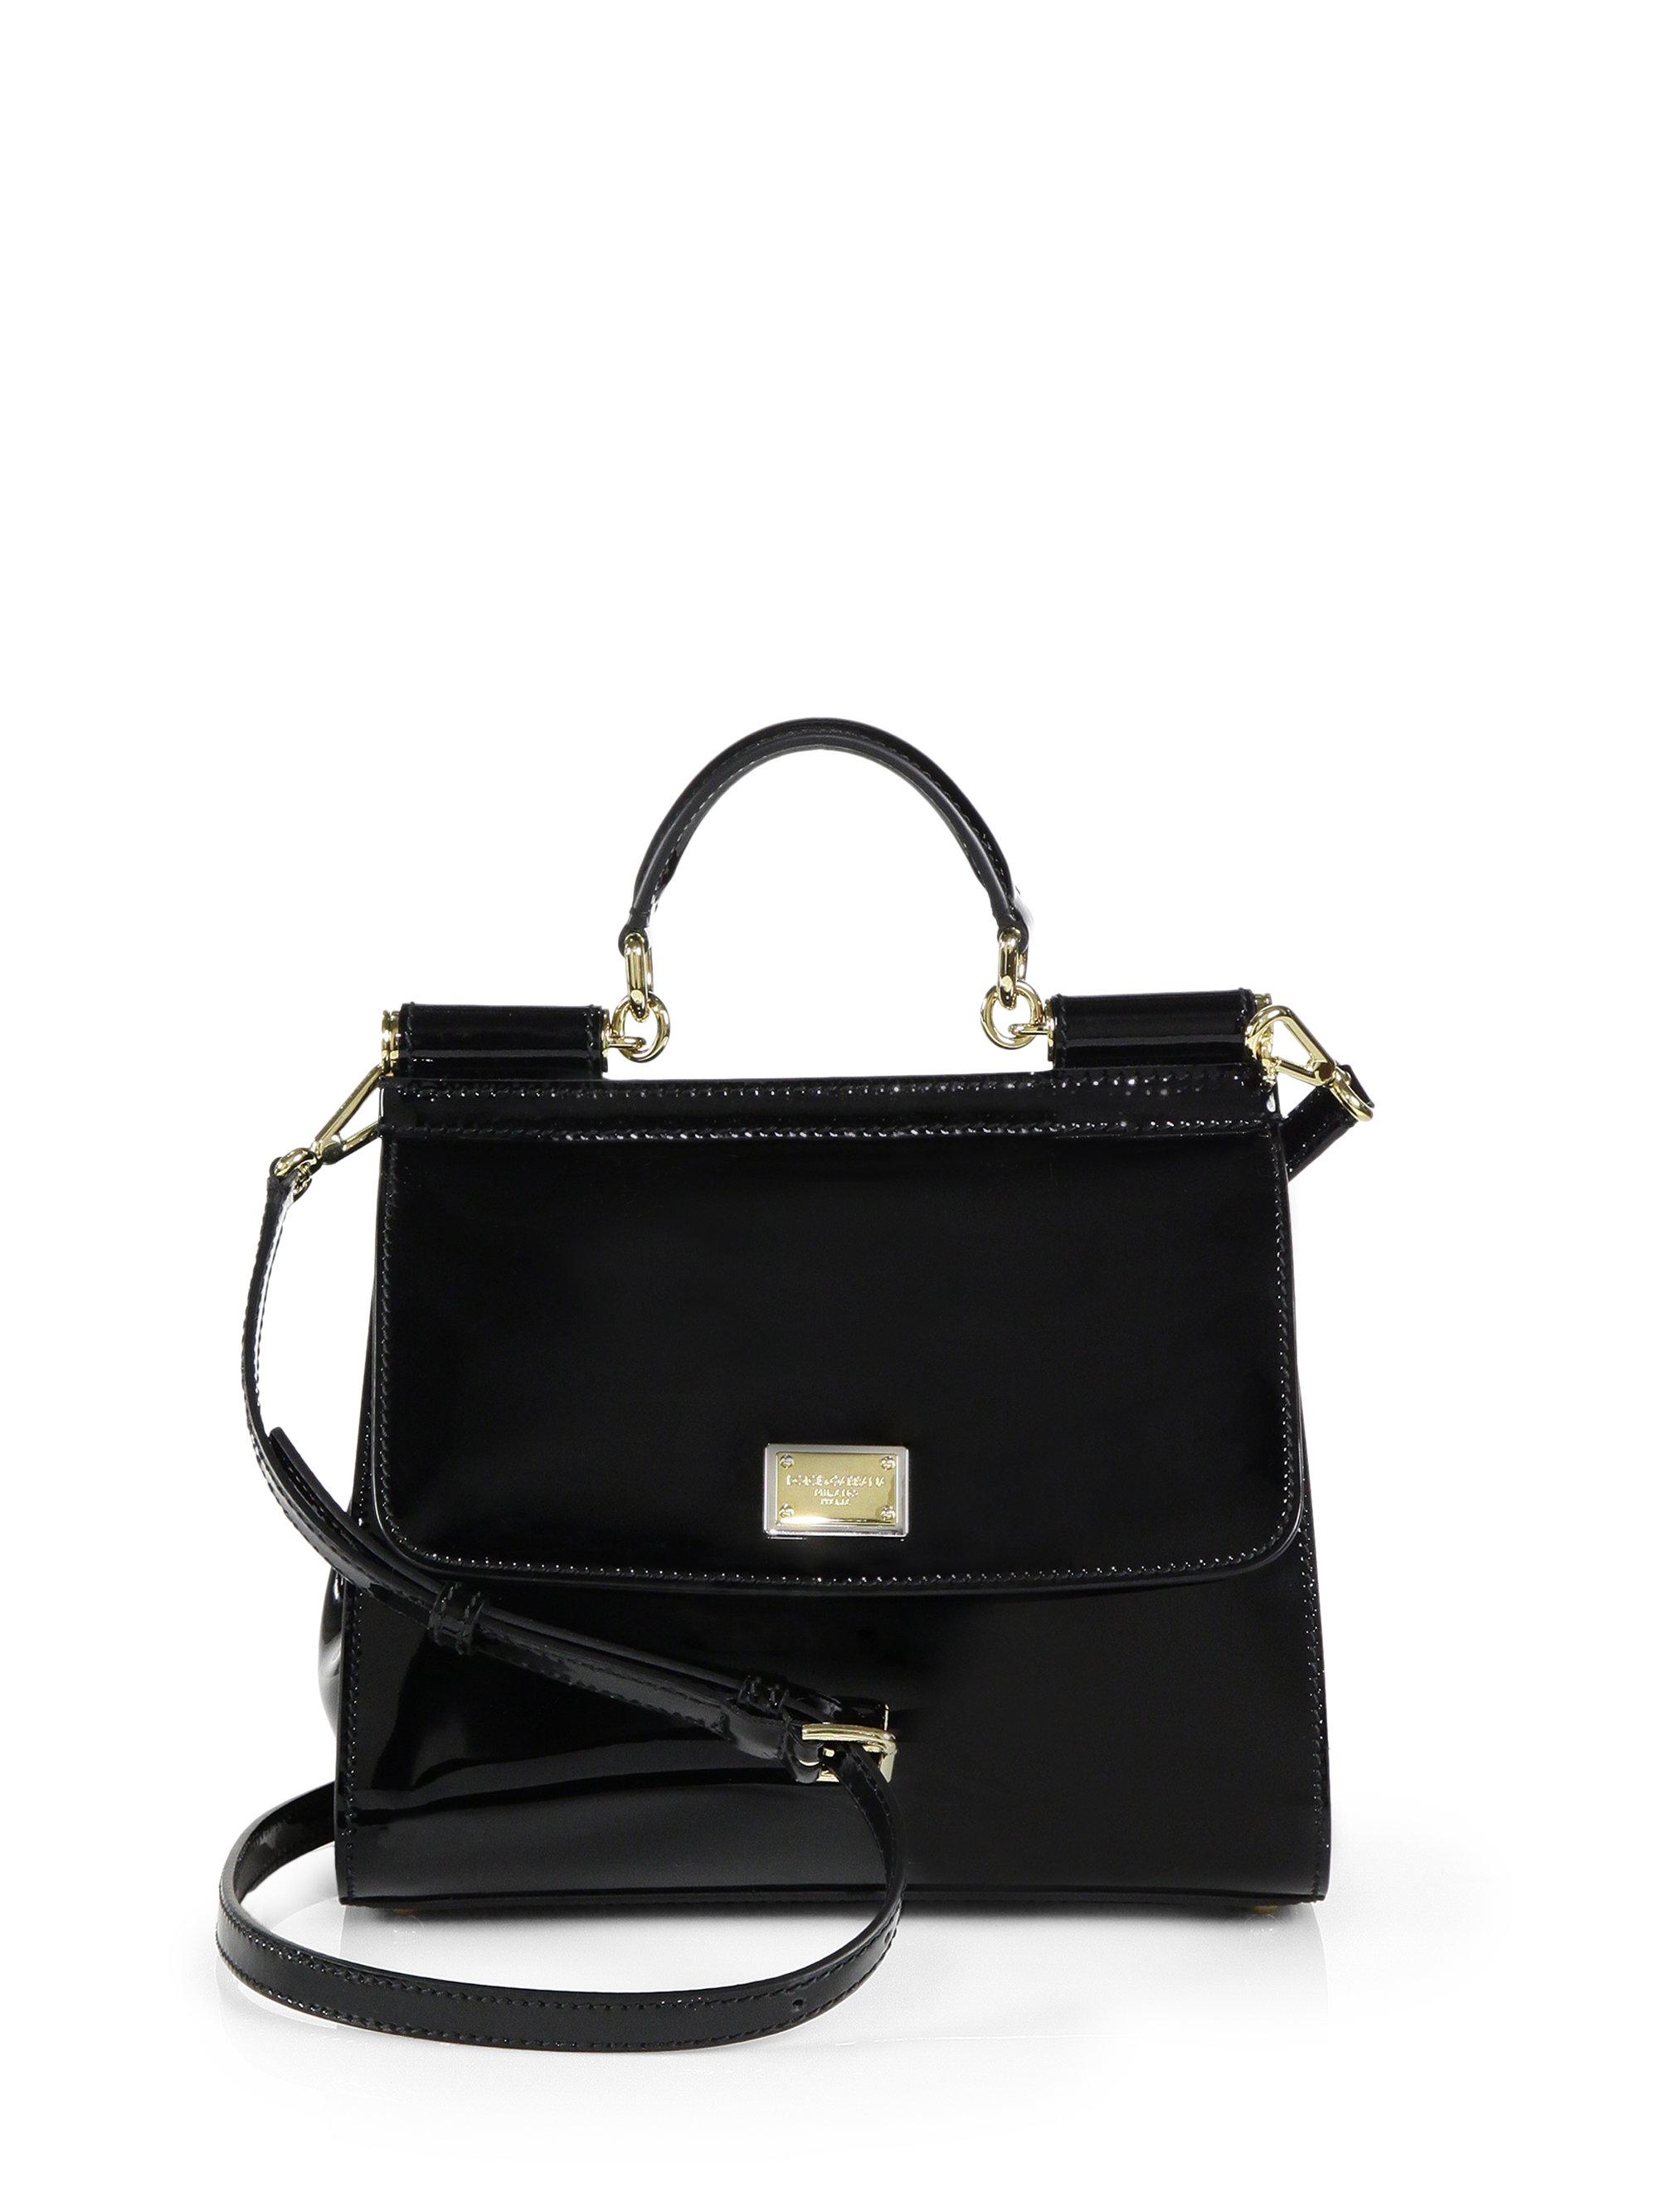 Black patent leather sicily bag 9As2jD1wSc